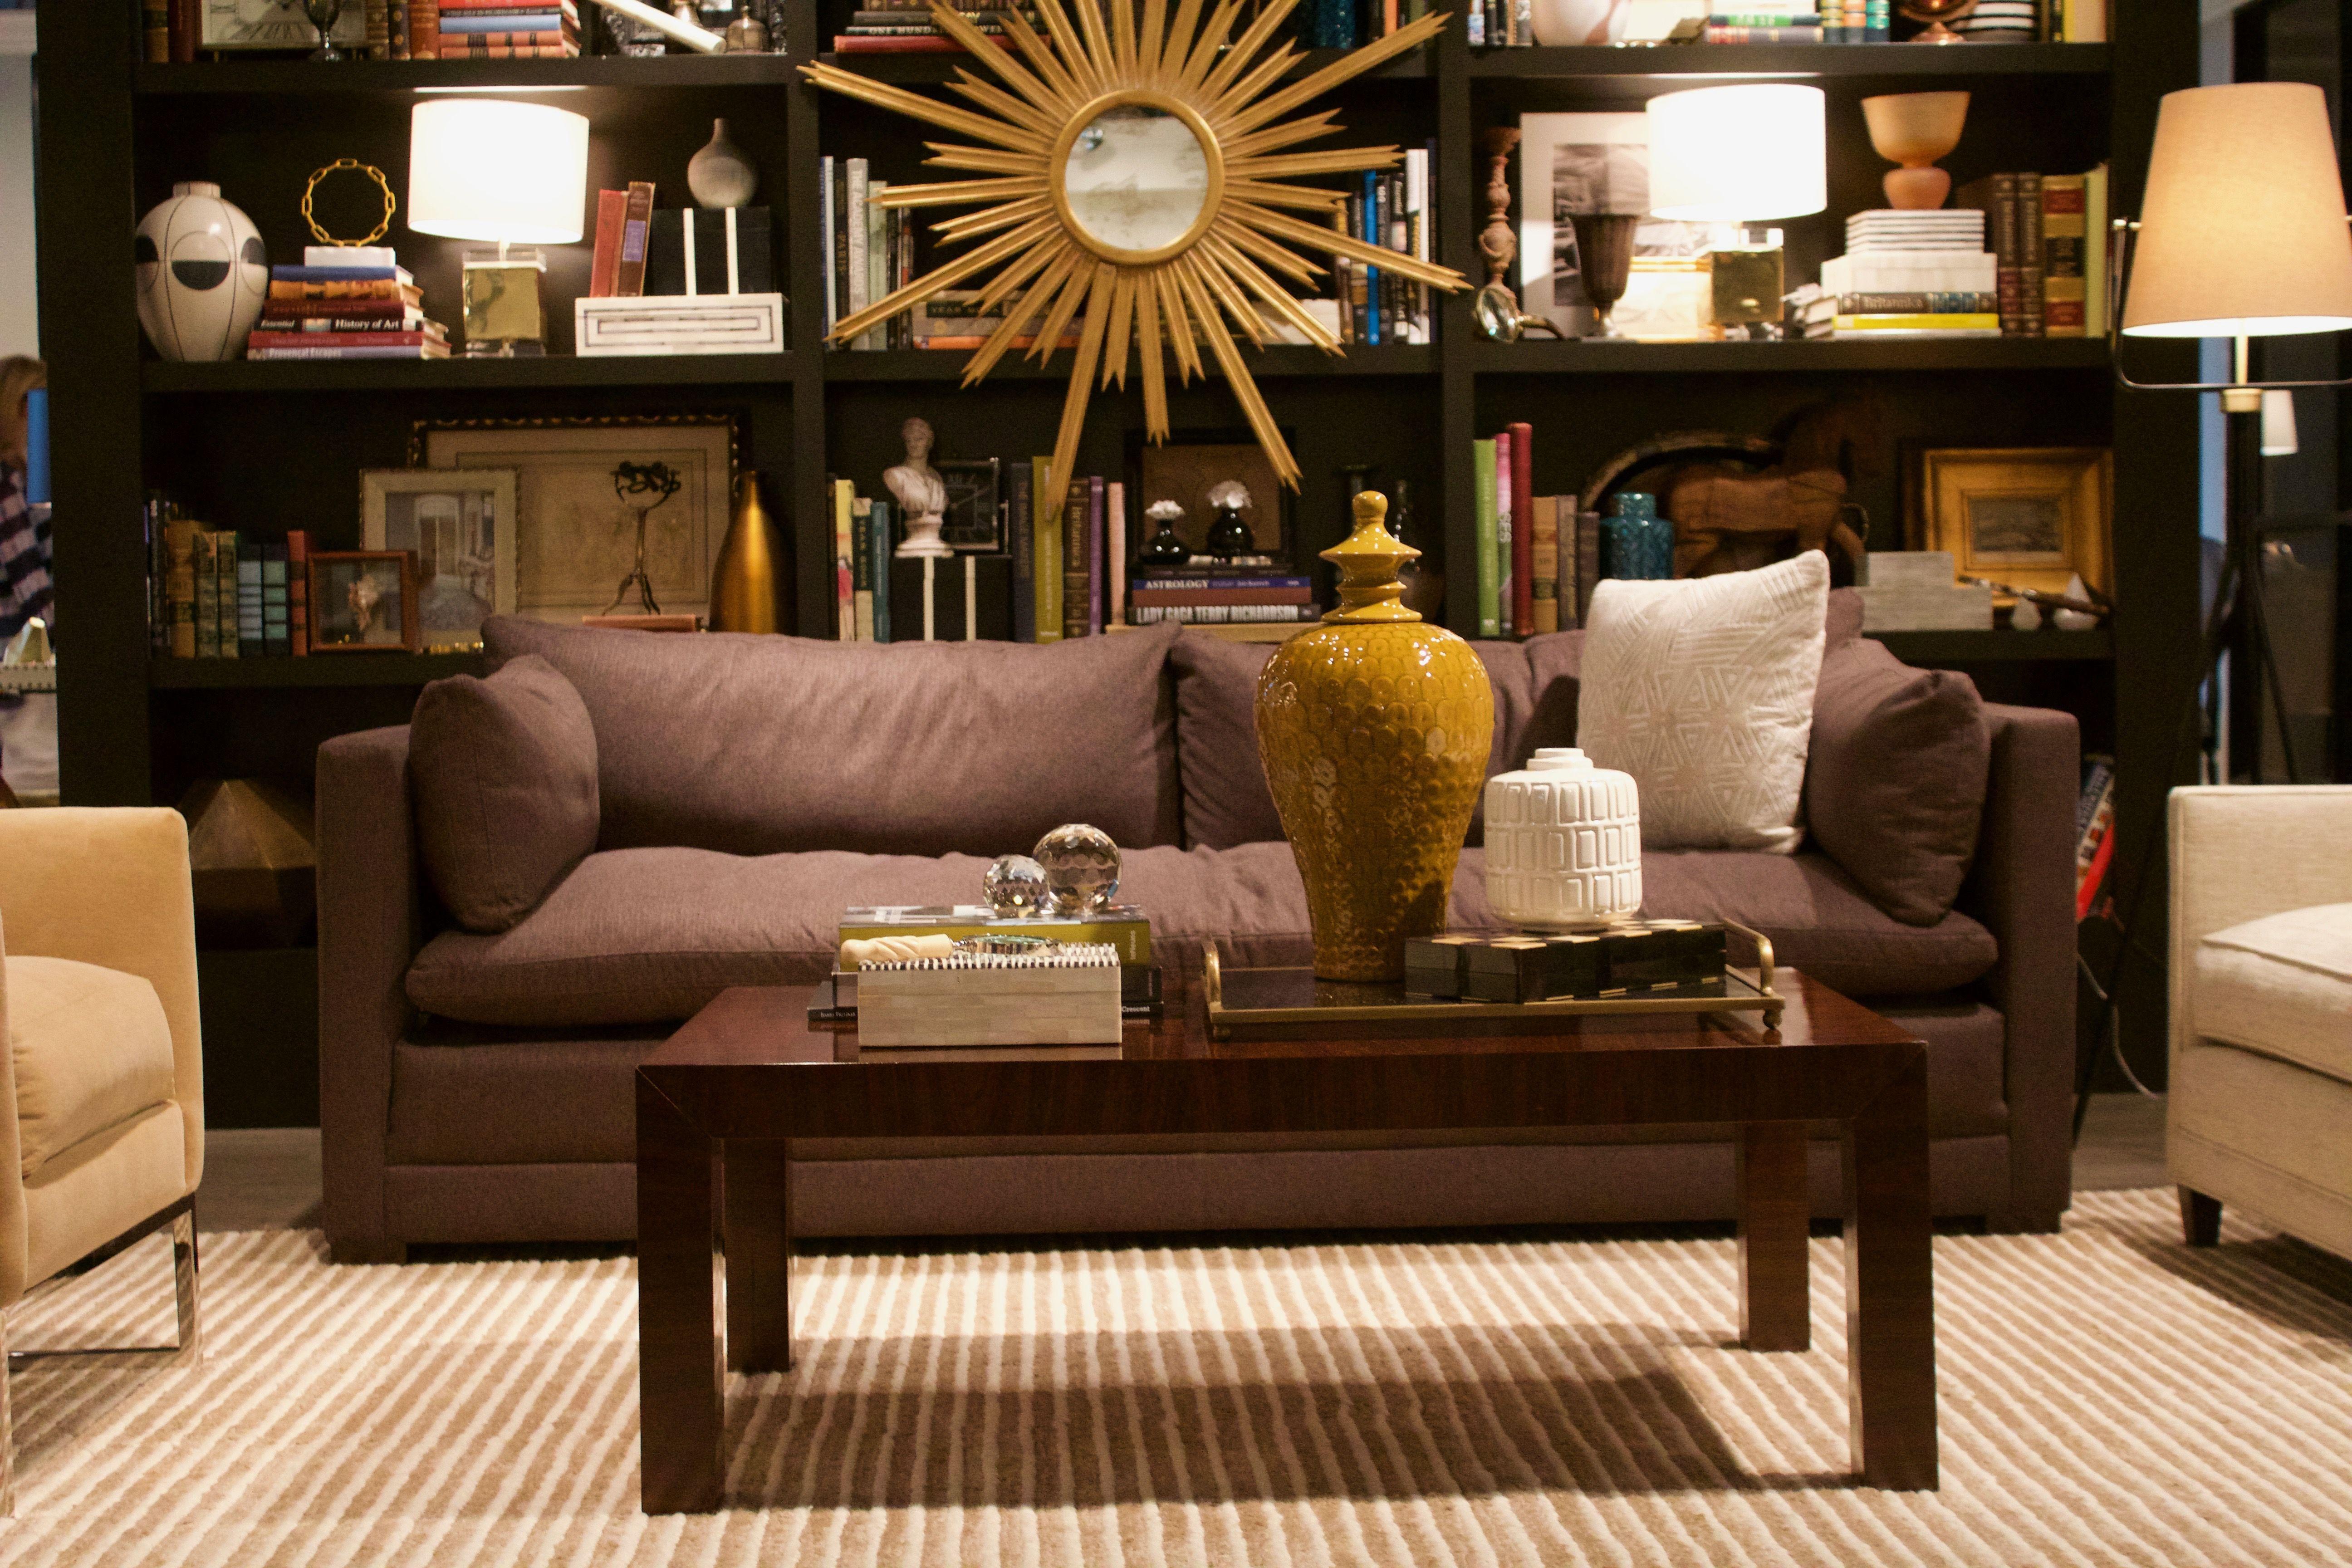 Hottest Interior Design Trends For 2018 And 2019 Amanda Gates Feng Shui Interior Design Interior Interior Design Trends